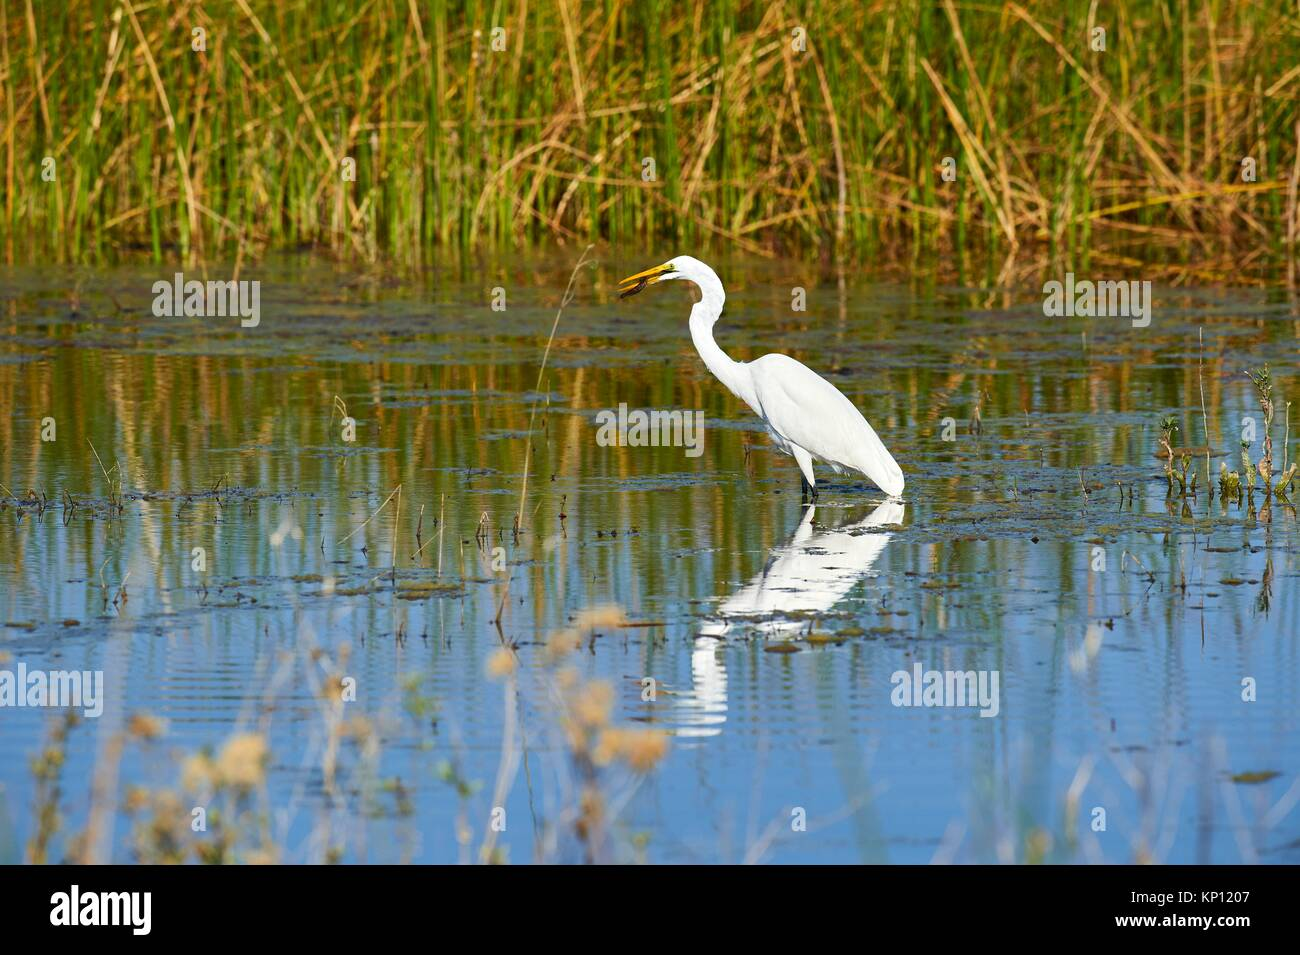 Great Egret flying (Ardea alba), catching fish in swamp, Moremi National Park, Okavango Delta, Botswana, Southern - Stock Image